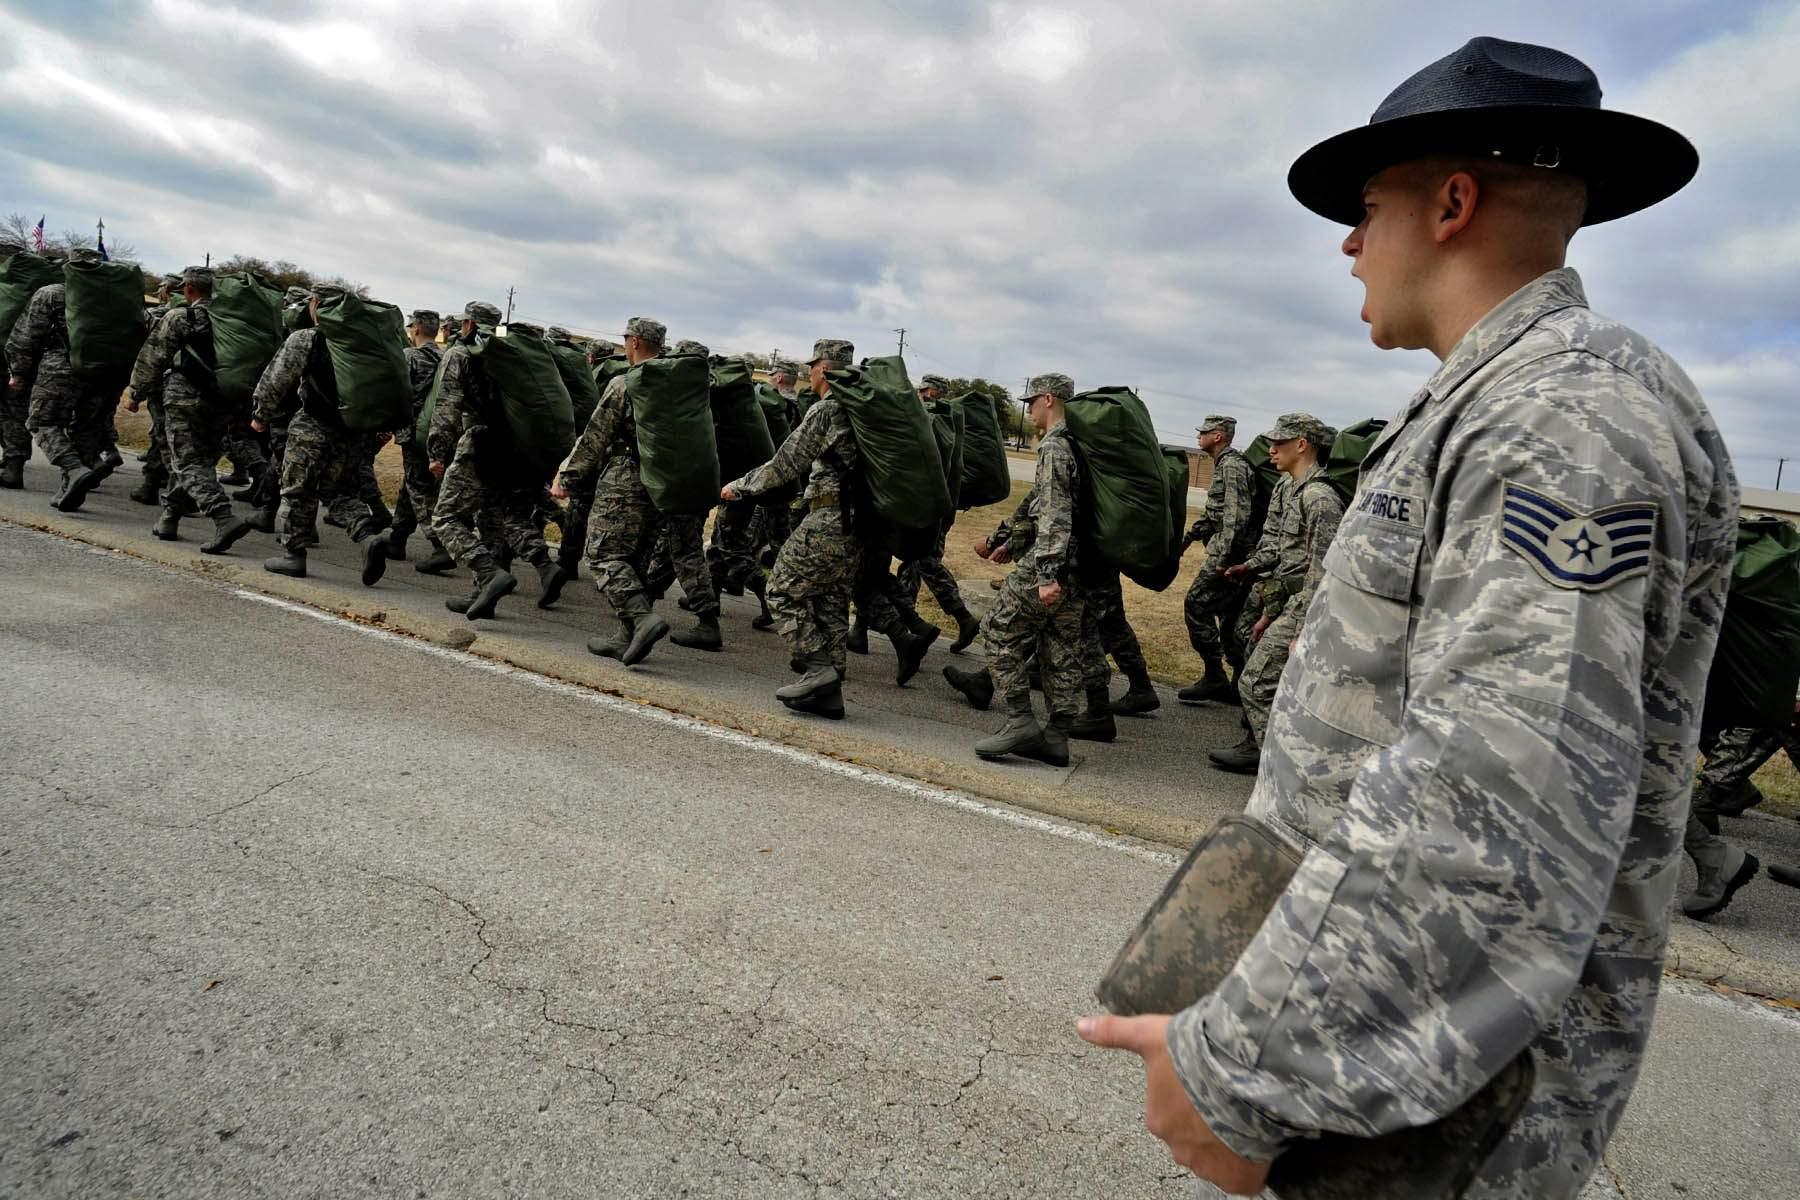 body fat percentage to enlist in army